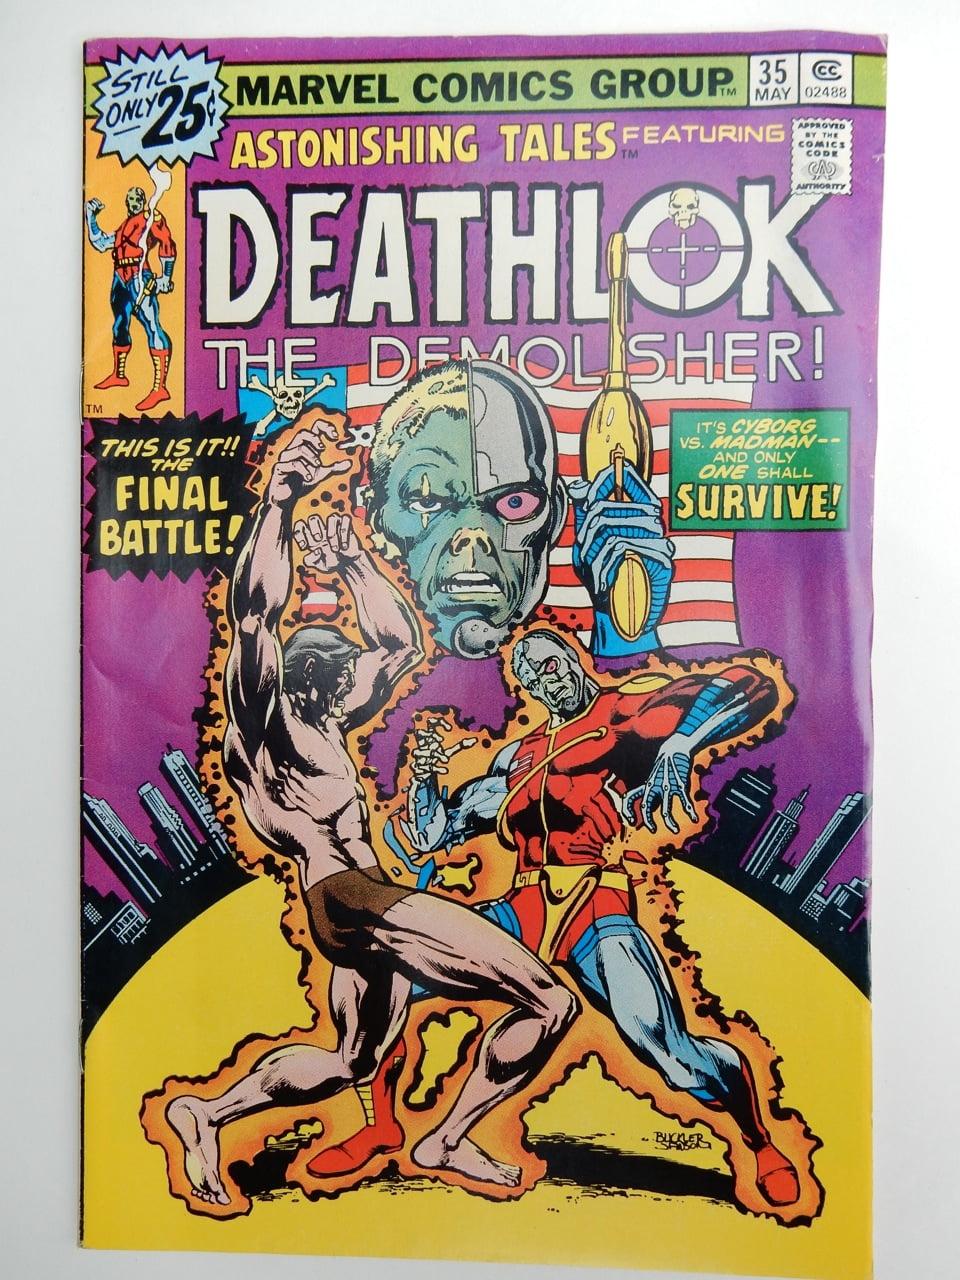 Astonishing Tales #35 Deathlok The Demolisher